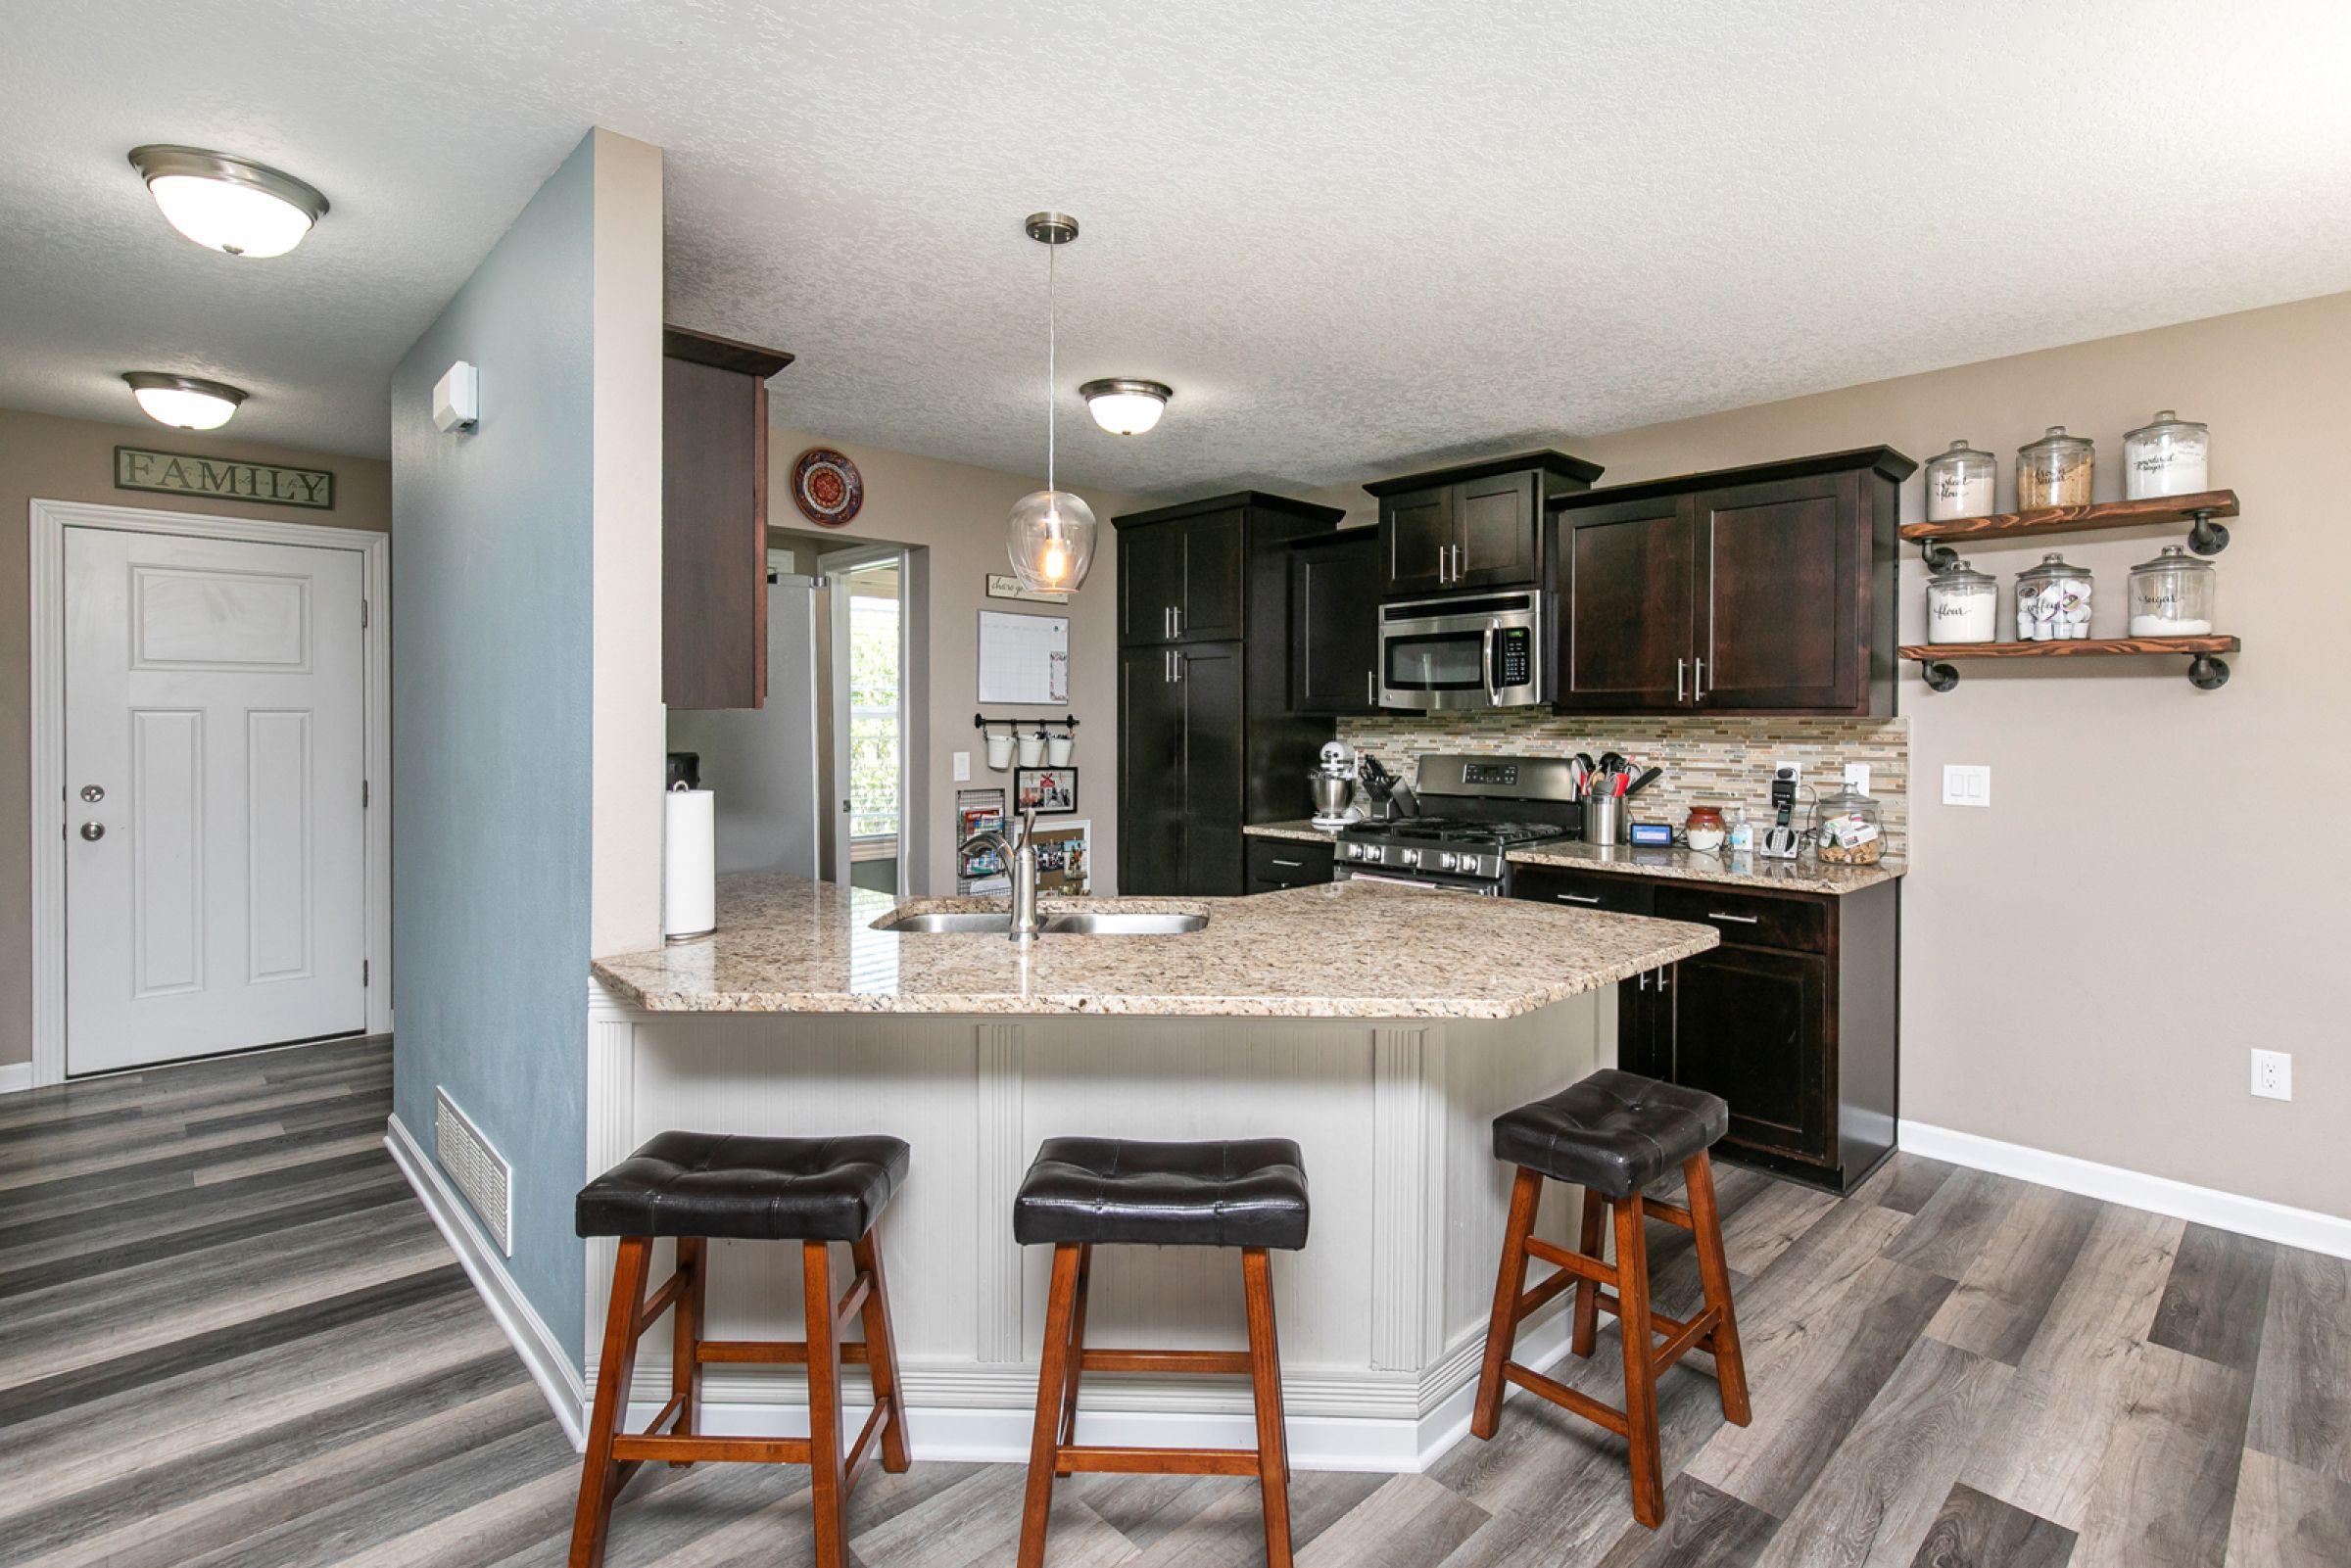 residential-warren-county-iowa-0-acres-listing-number-15685-6-2021-08-31-032157.jpg